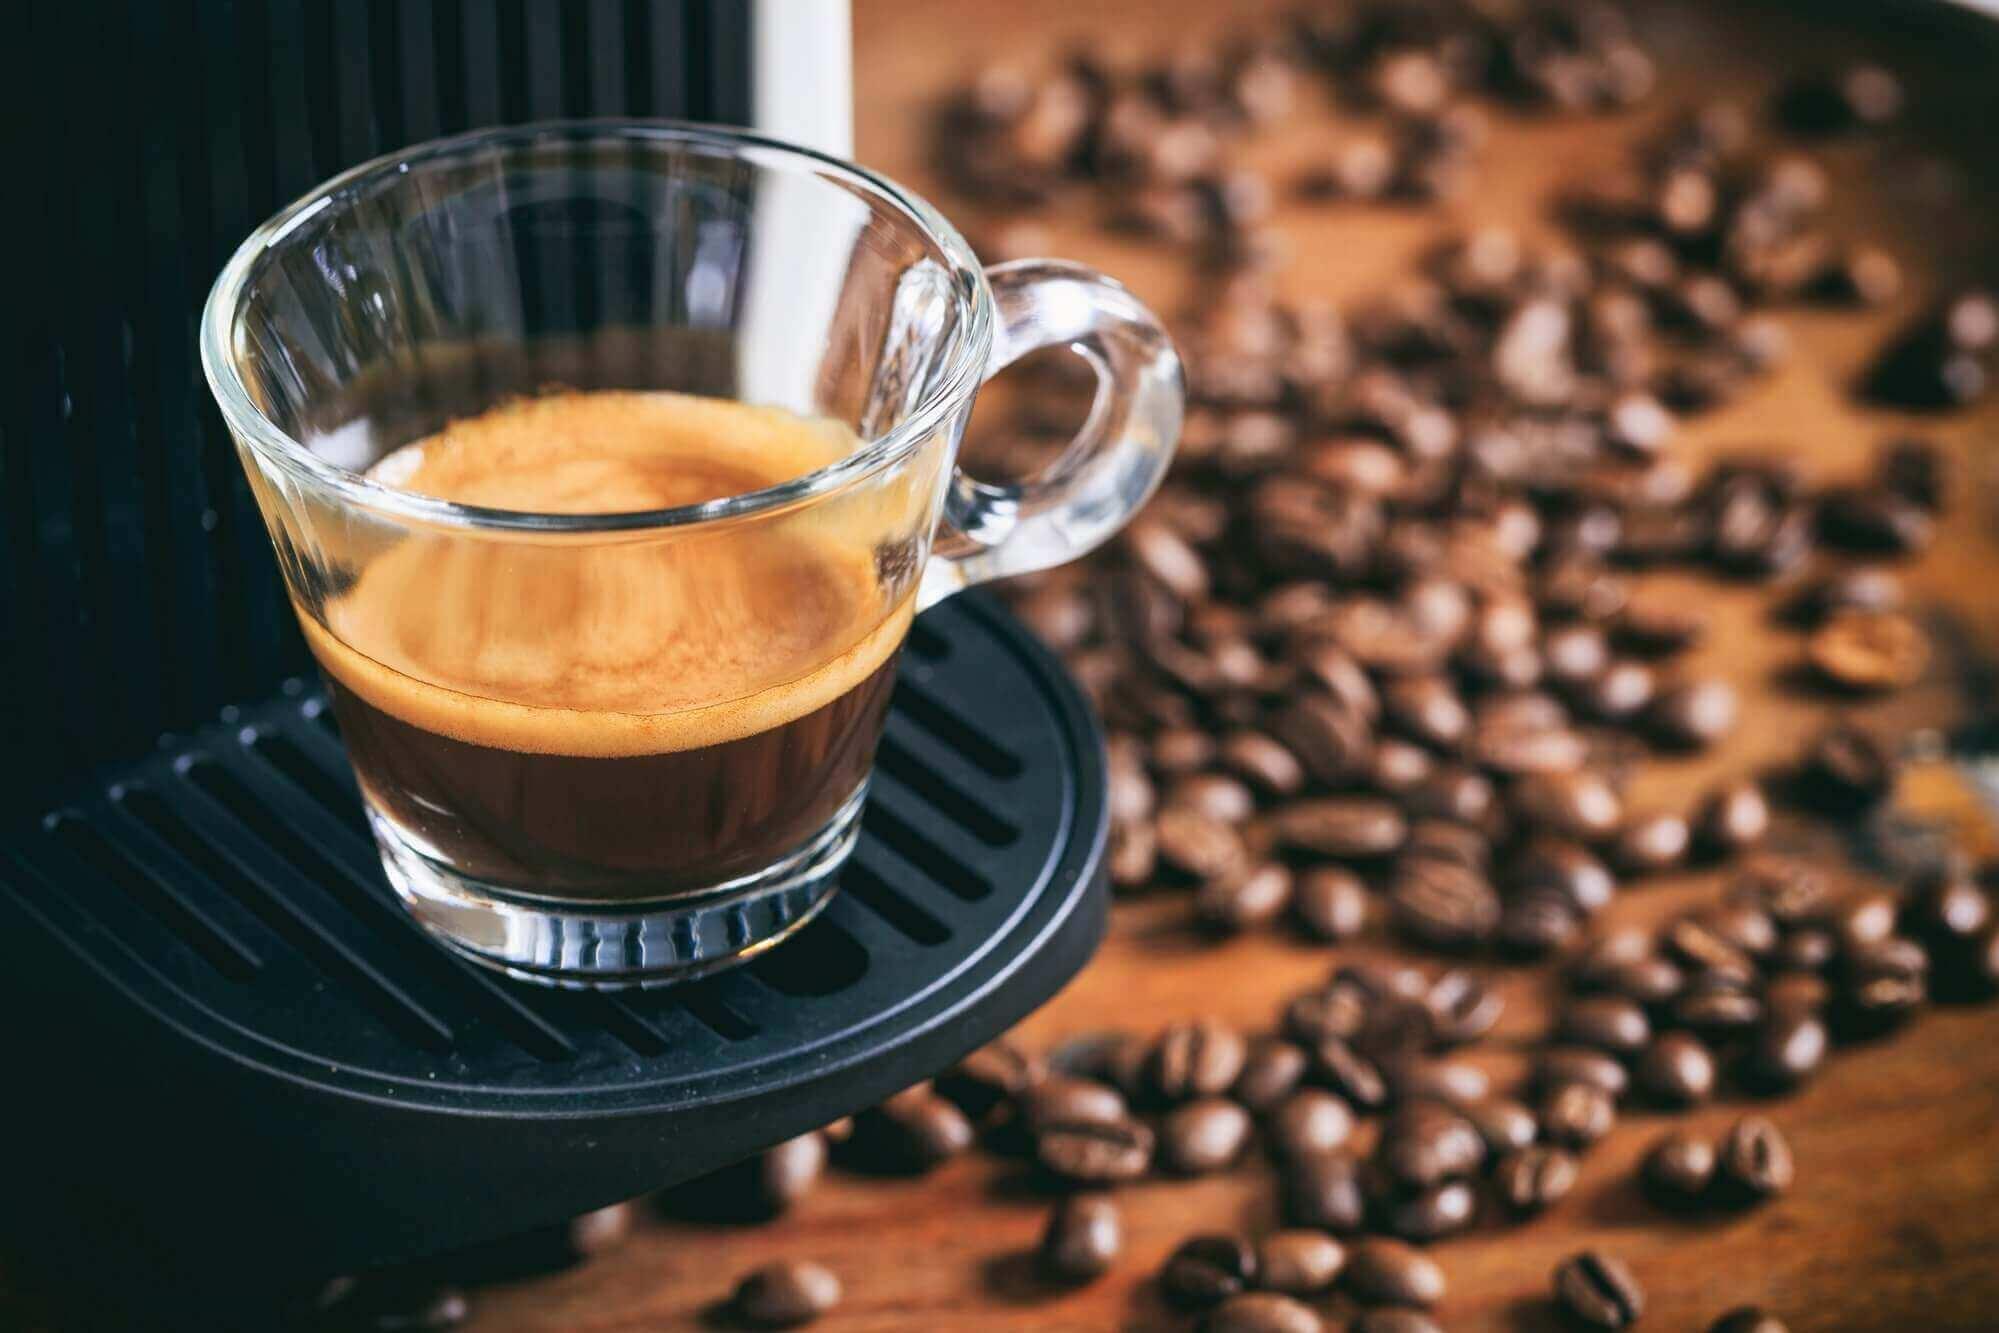 Amount of caffeine in Espresso coffee